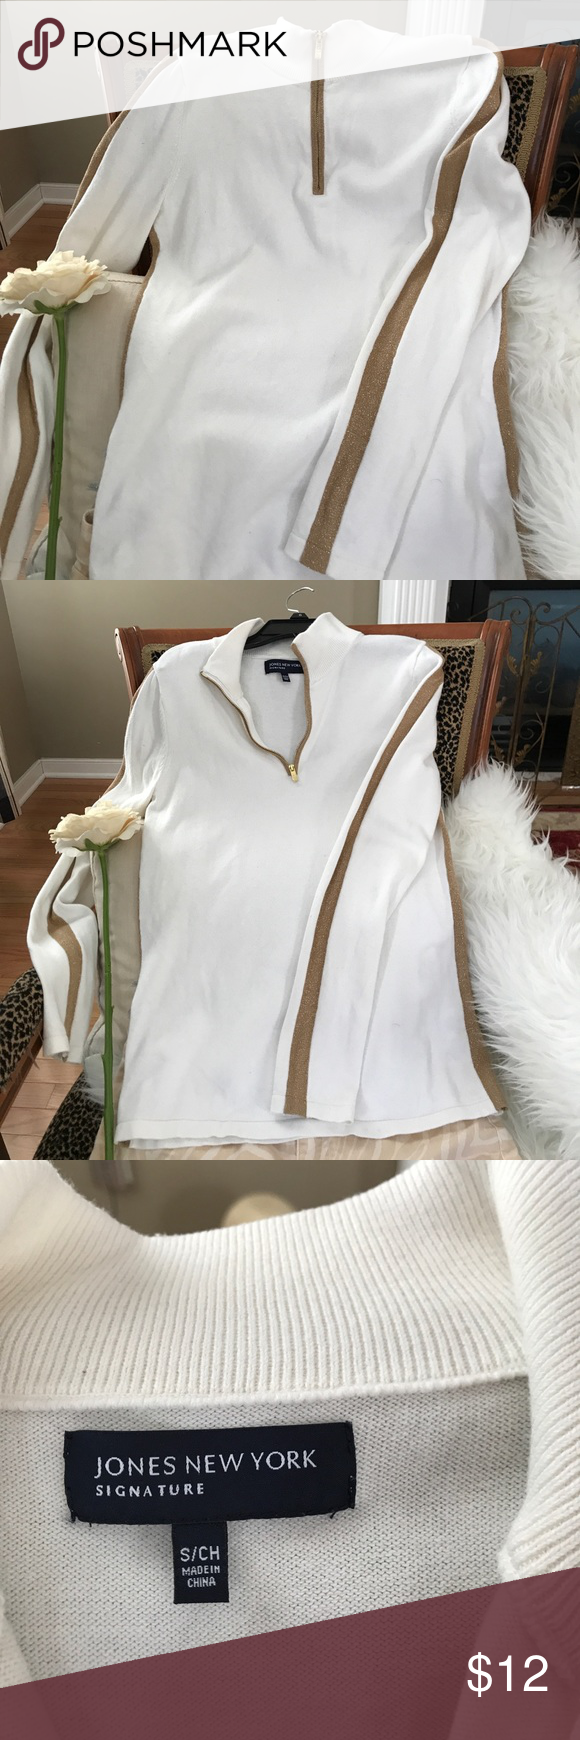 Jones New York sweater | Gold stripes, White sweaters and Customer ...